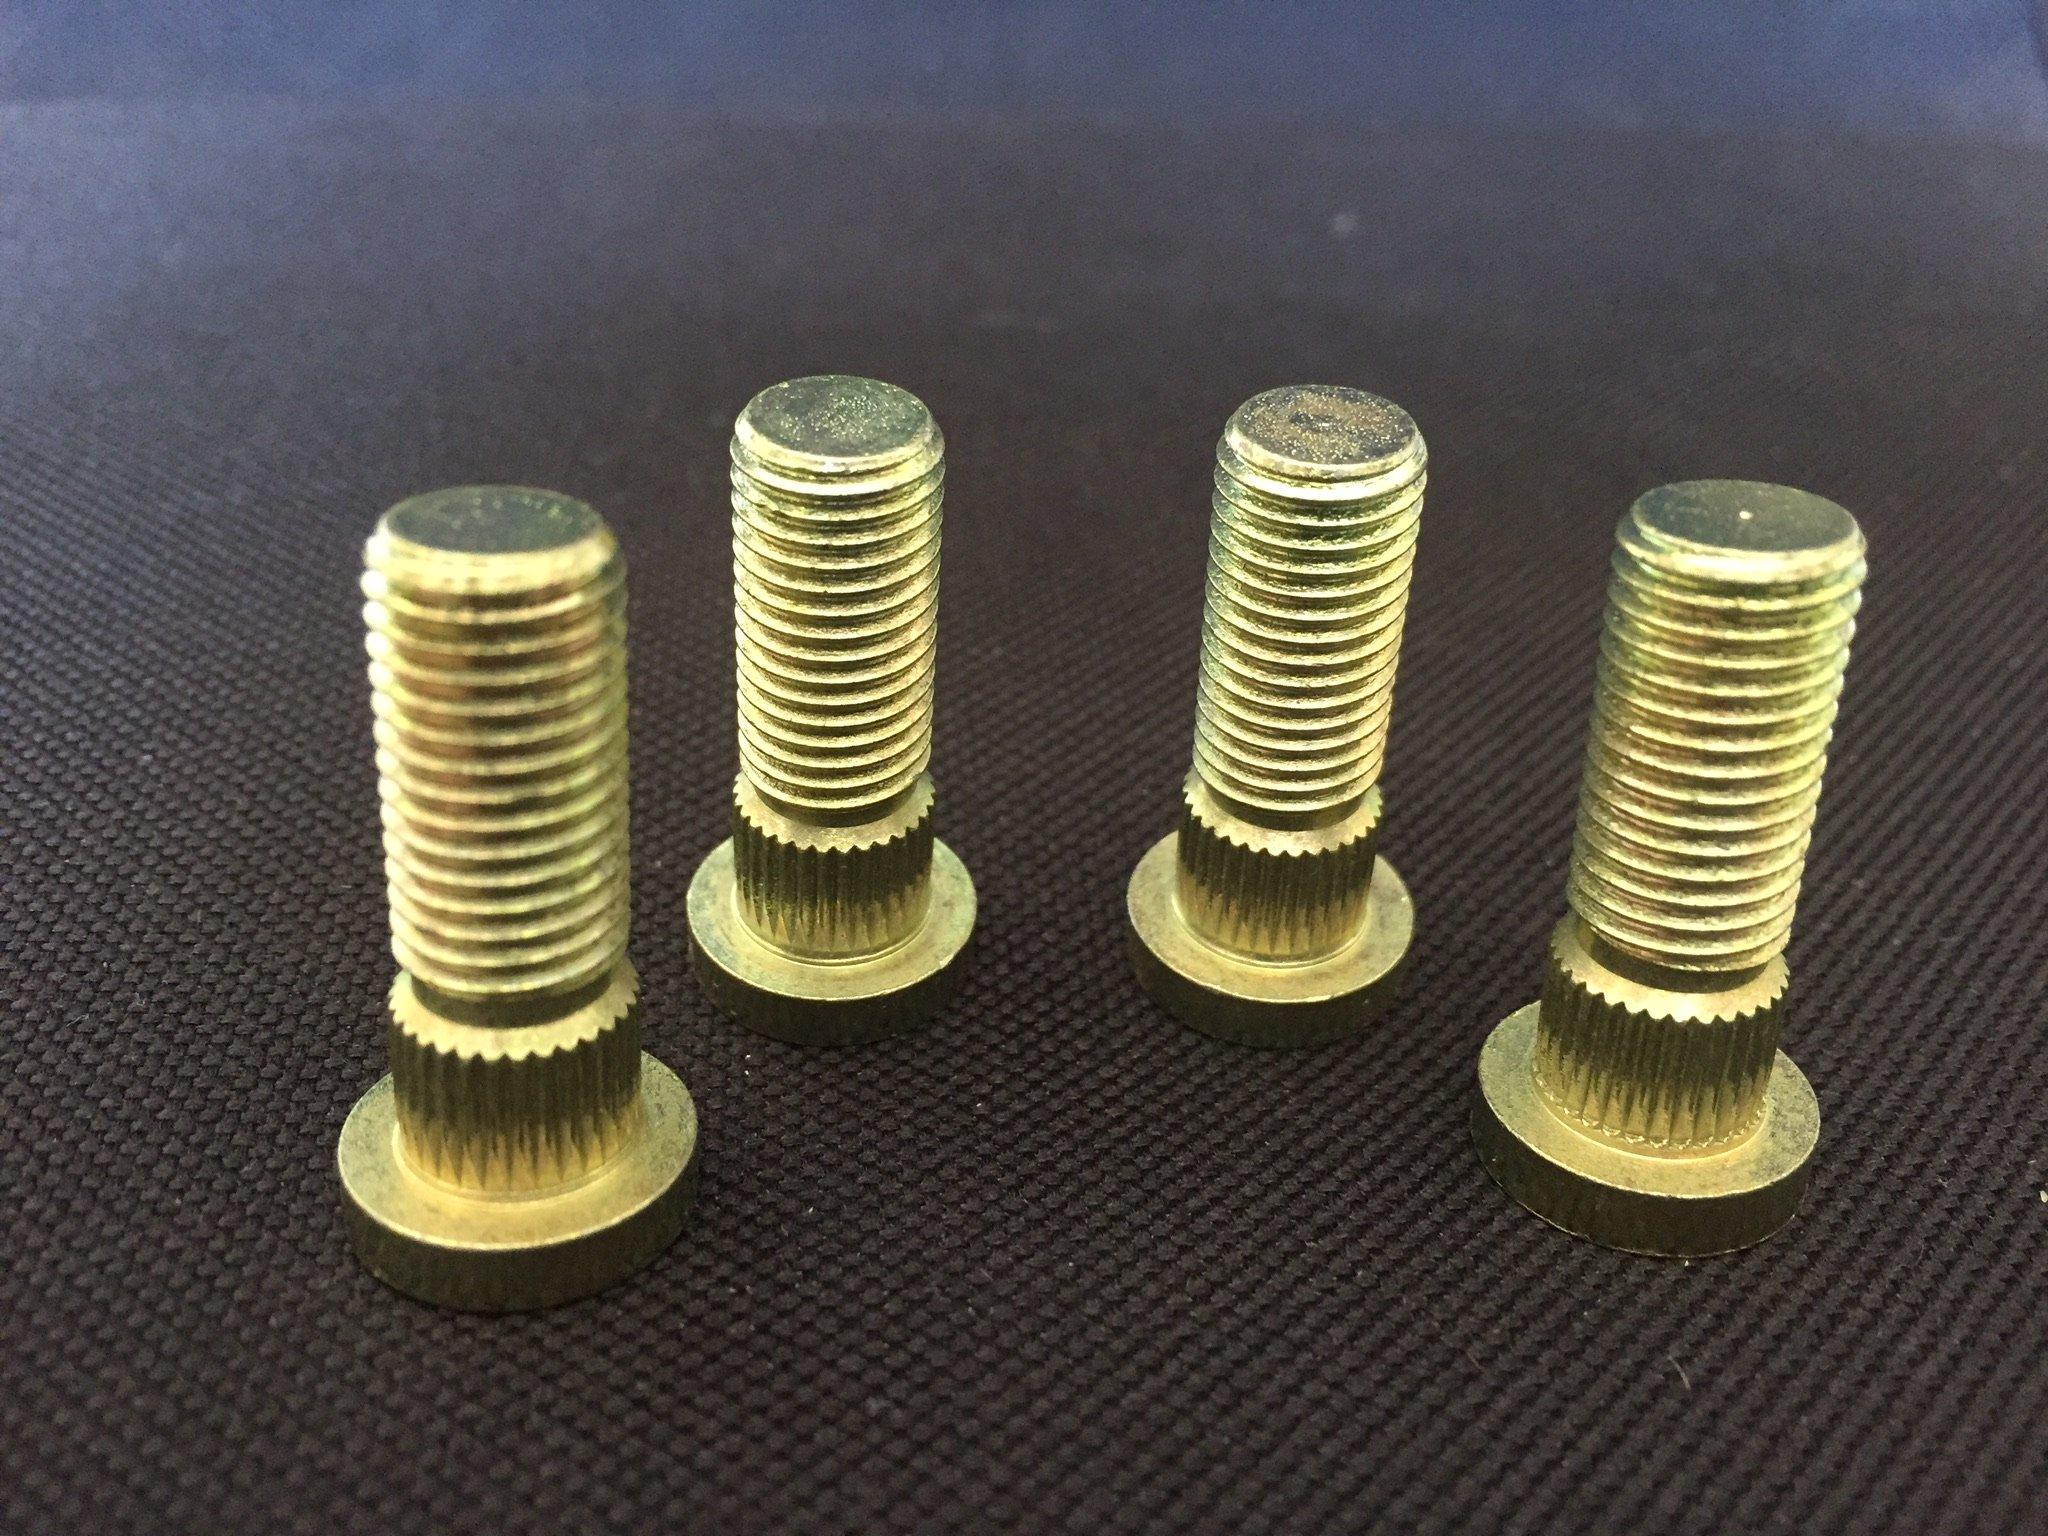 Wheel Studs for Suzuki ATV LTZ400 Z400 LTR450 .421/10.7mm Spline 100% U.S Made